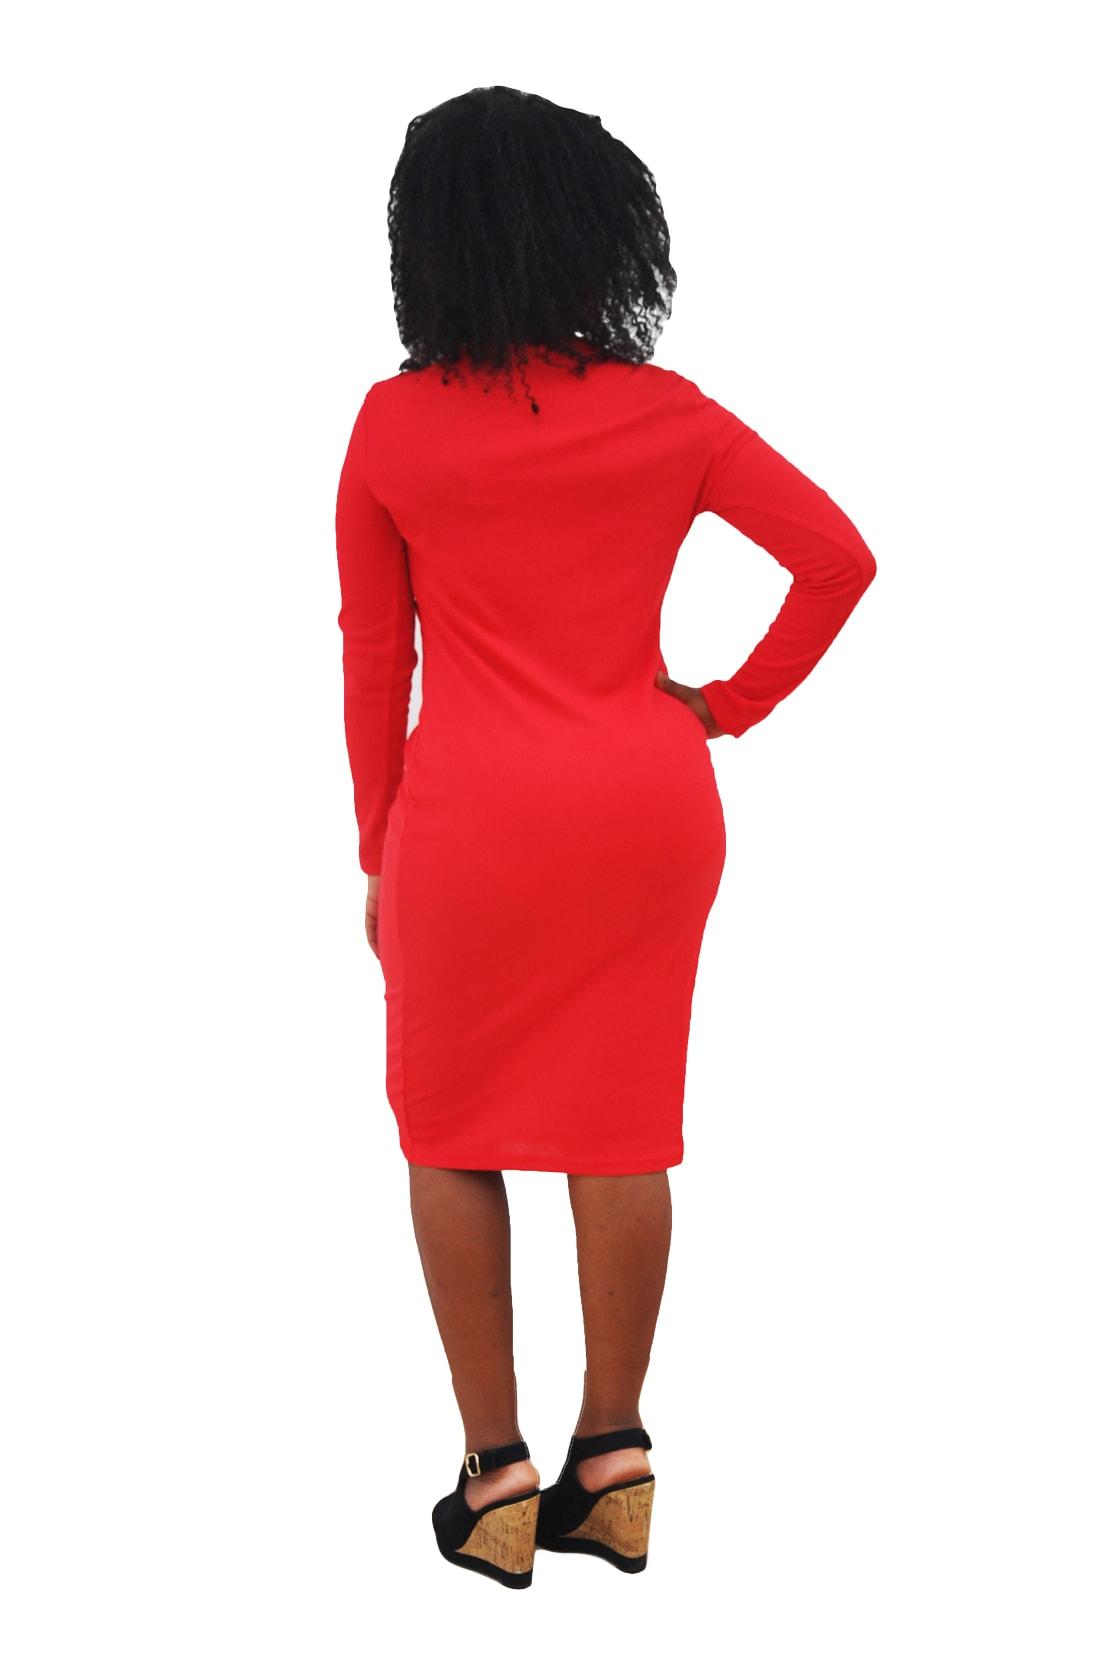 M0253 red3 Office Evening Dresses maureens.com boutique